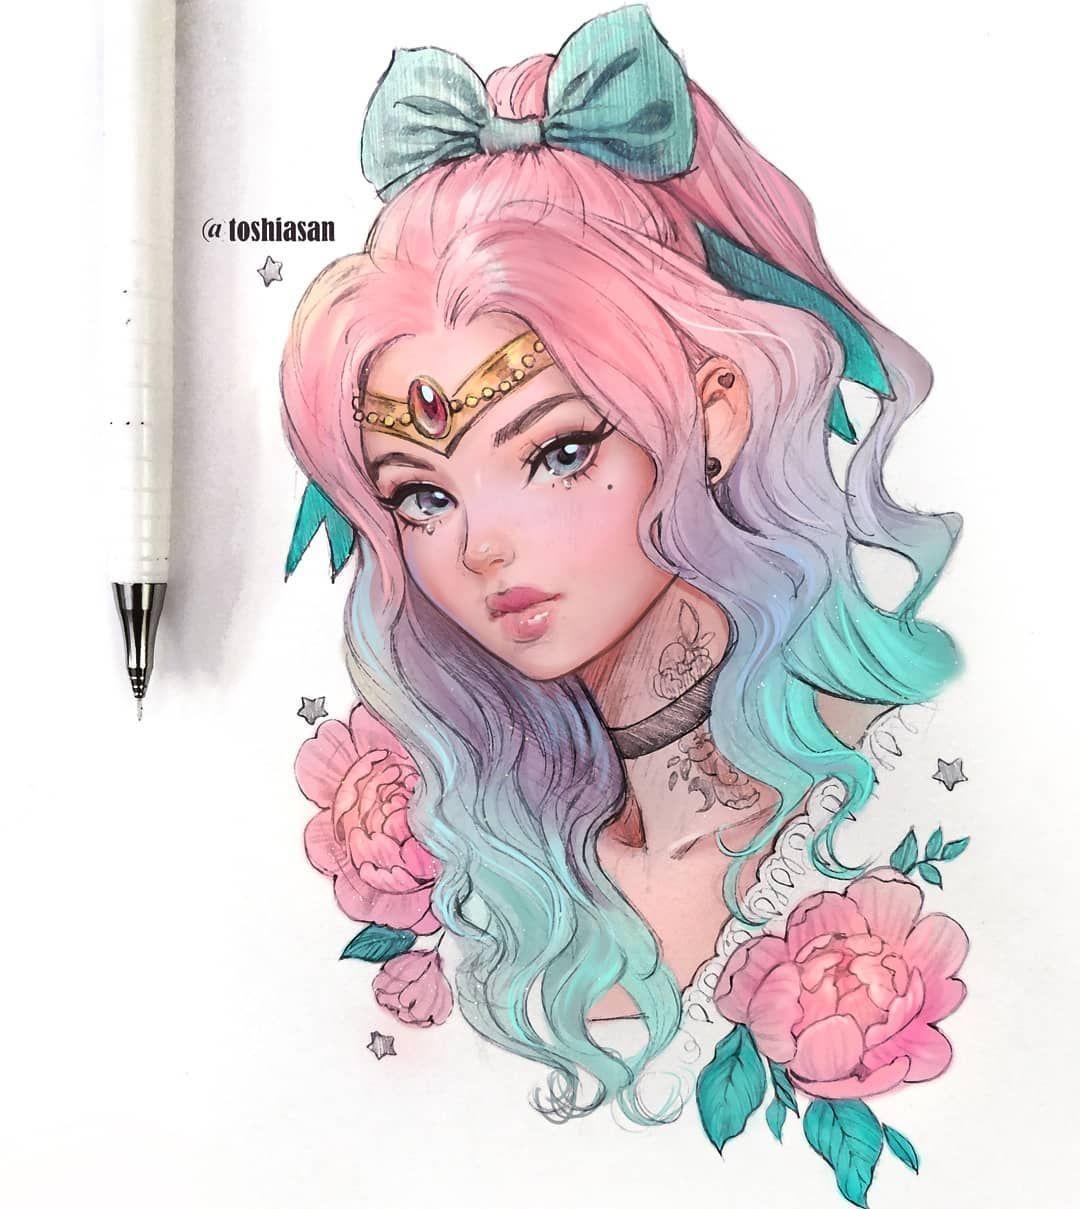 Unicorn Princess She Was A Unicorn Wishing To Be A Girl The Good Witch Gave Her The Gold Tiara To Change H Cute Kawaii Drawings Kawaii Drawings Cute Drawings